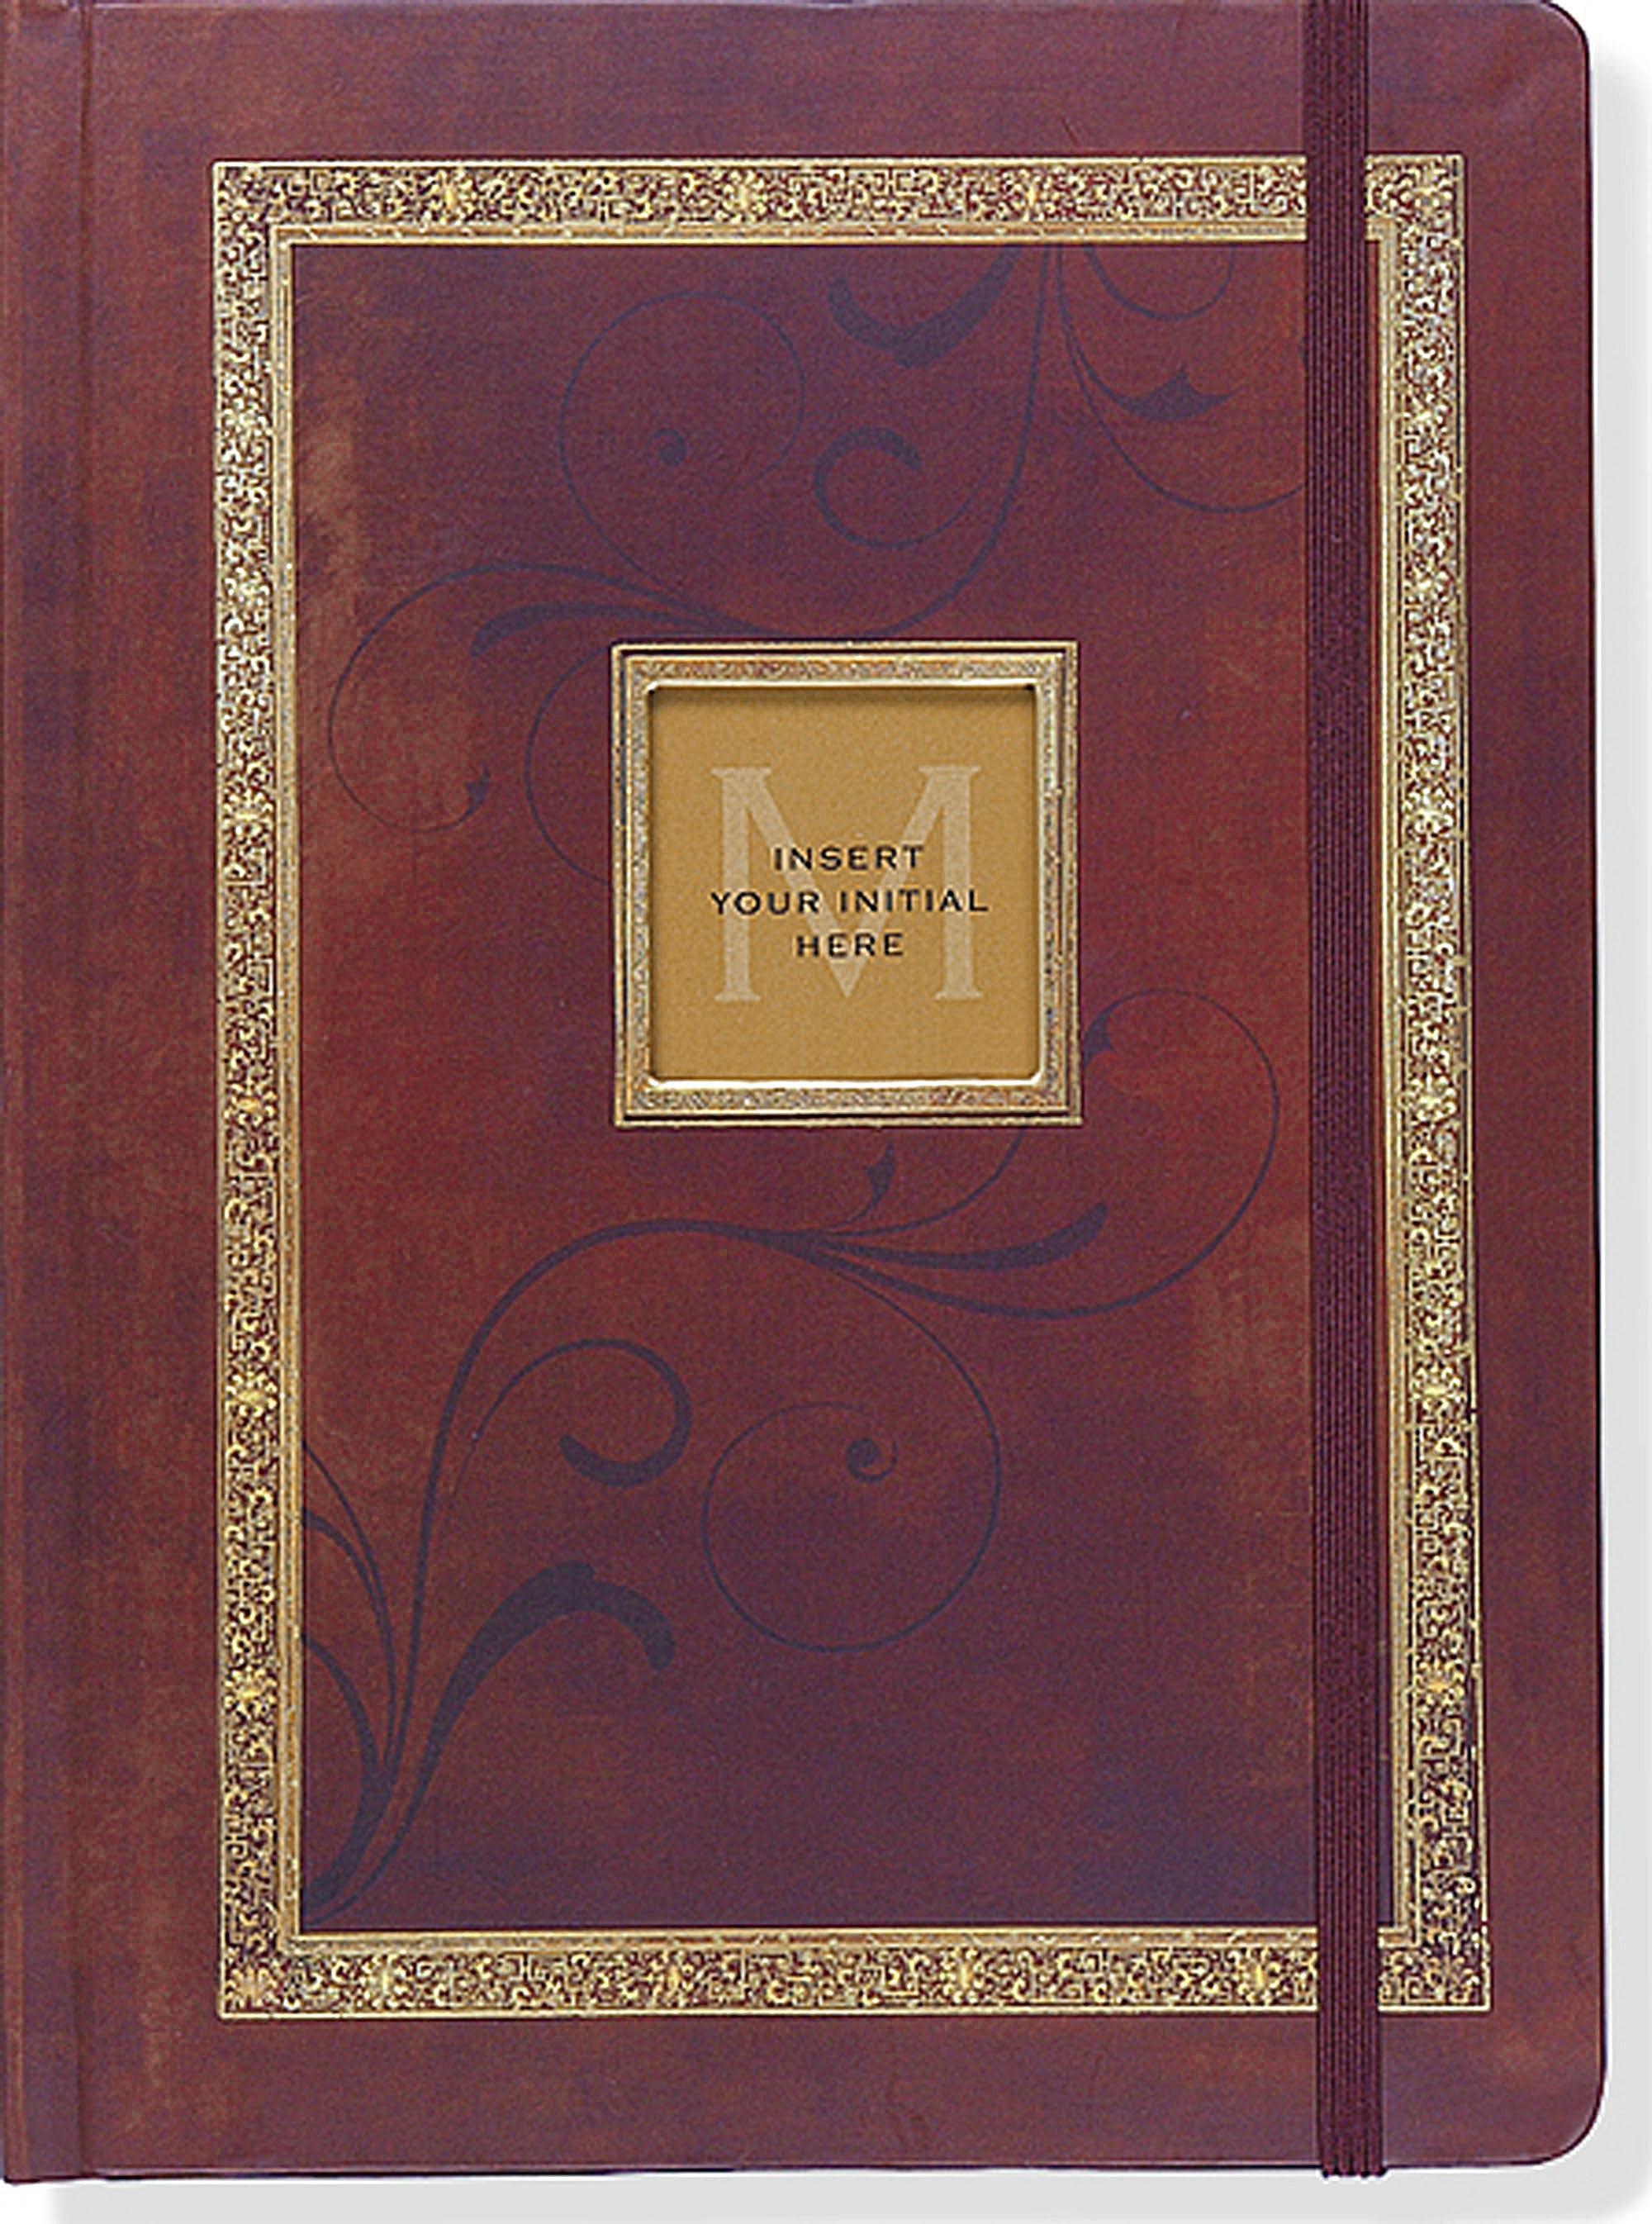 Antique Monogram Journal Diary Notebook Peter Pauper